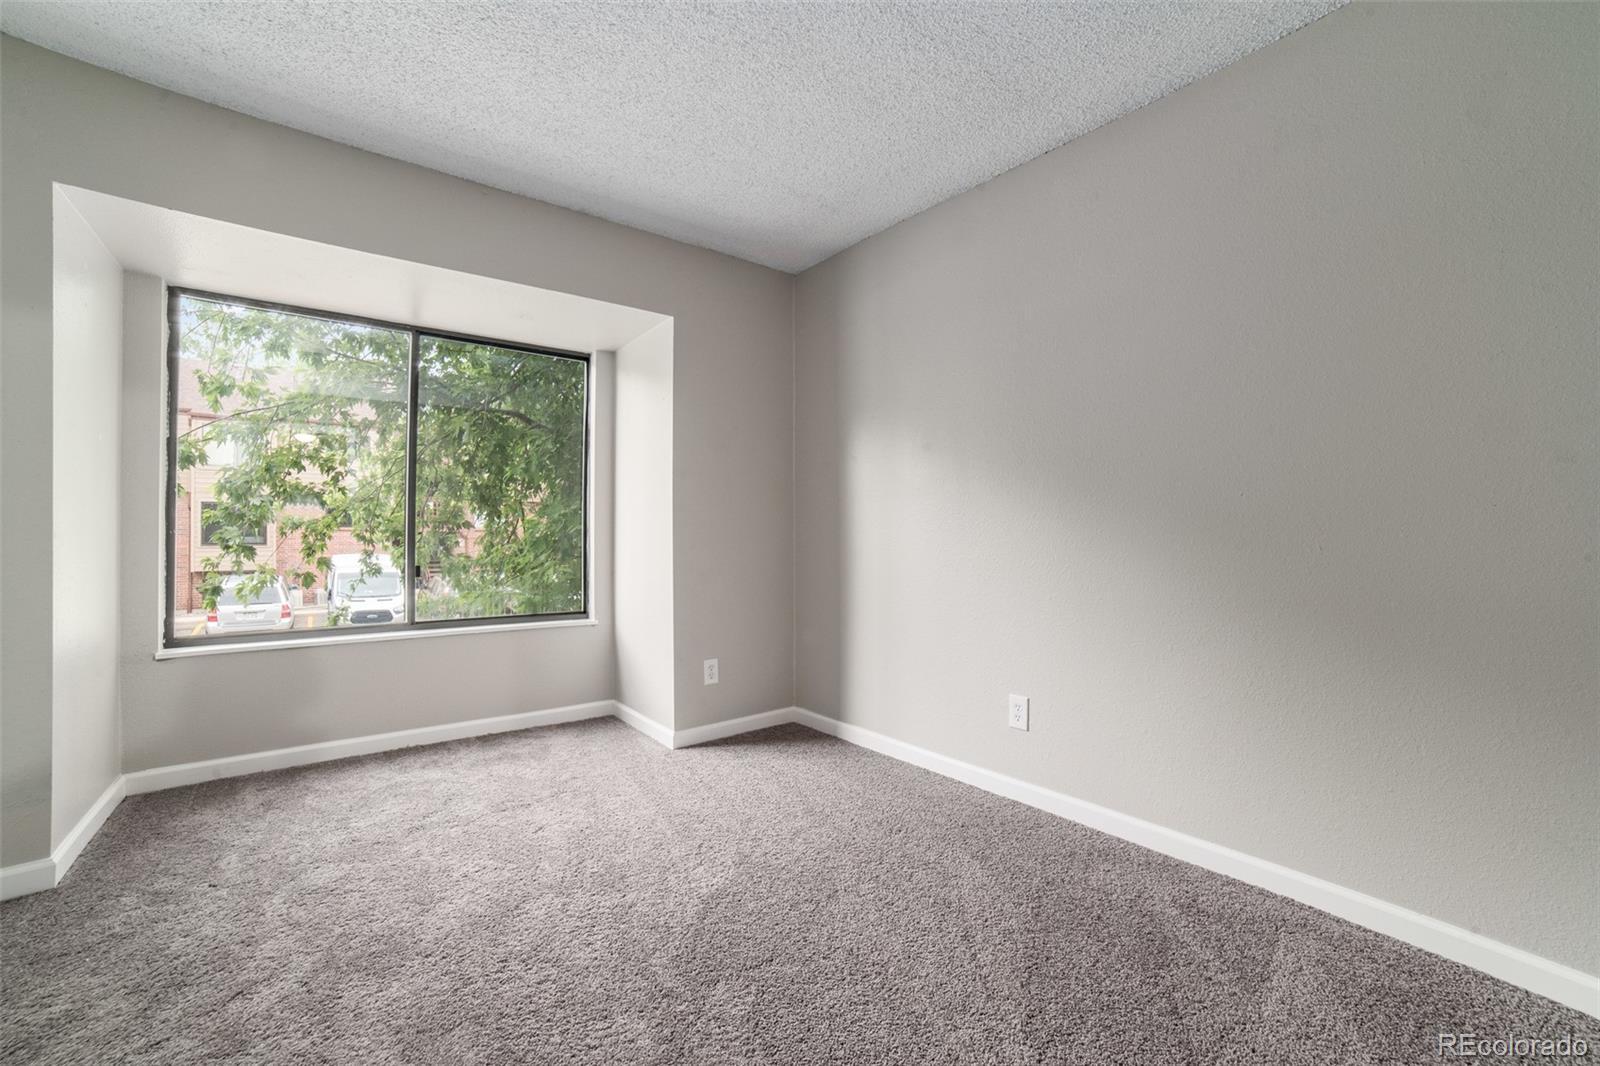 MLS# 8386467 - 16 - 220 Wright Street #203, Lakewood, CO 80228